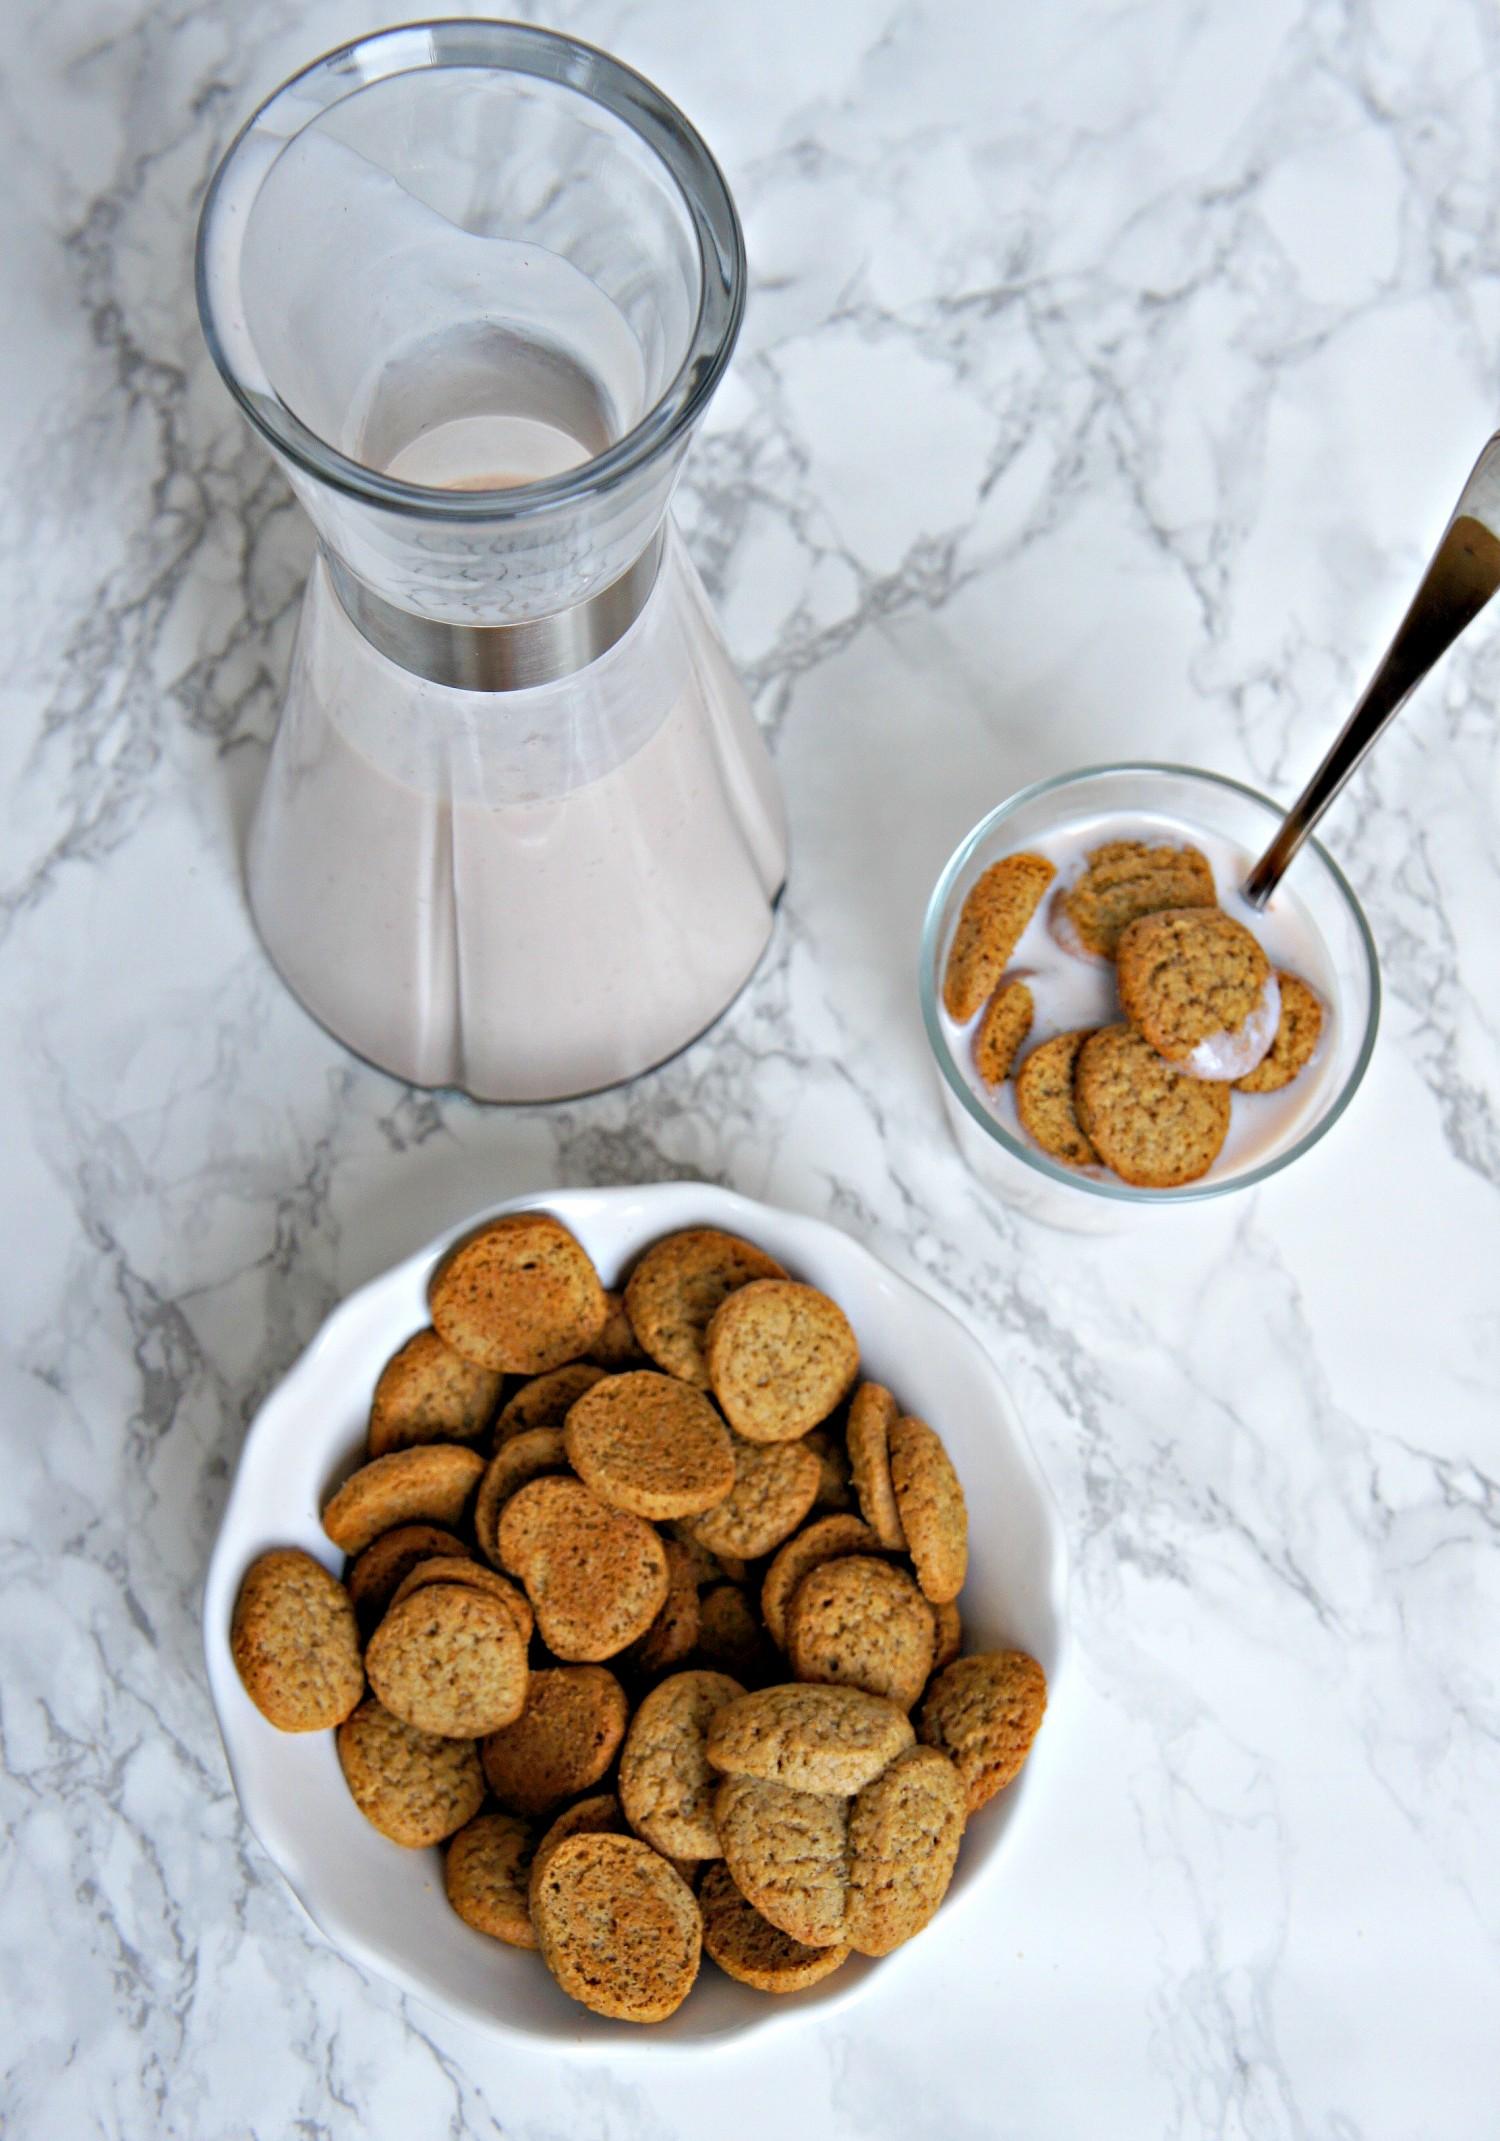 De bedste glutenfrie kammerjunker og den bedste veganske koldskål - Cathrineyoga - 6